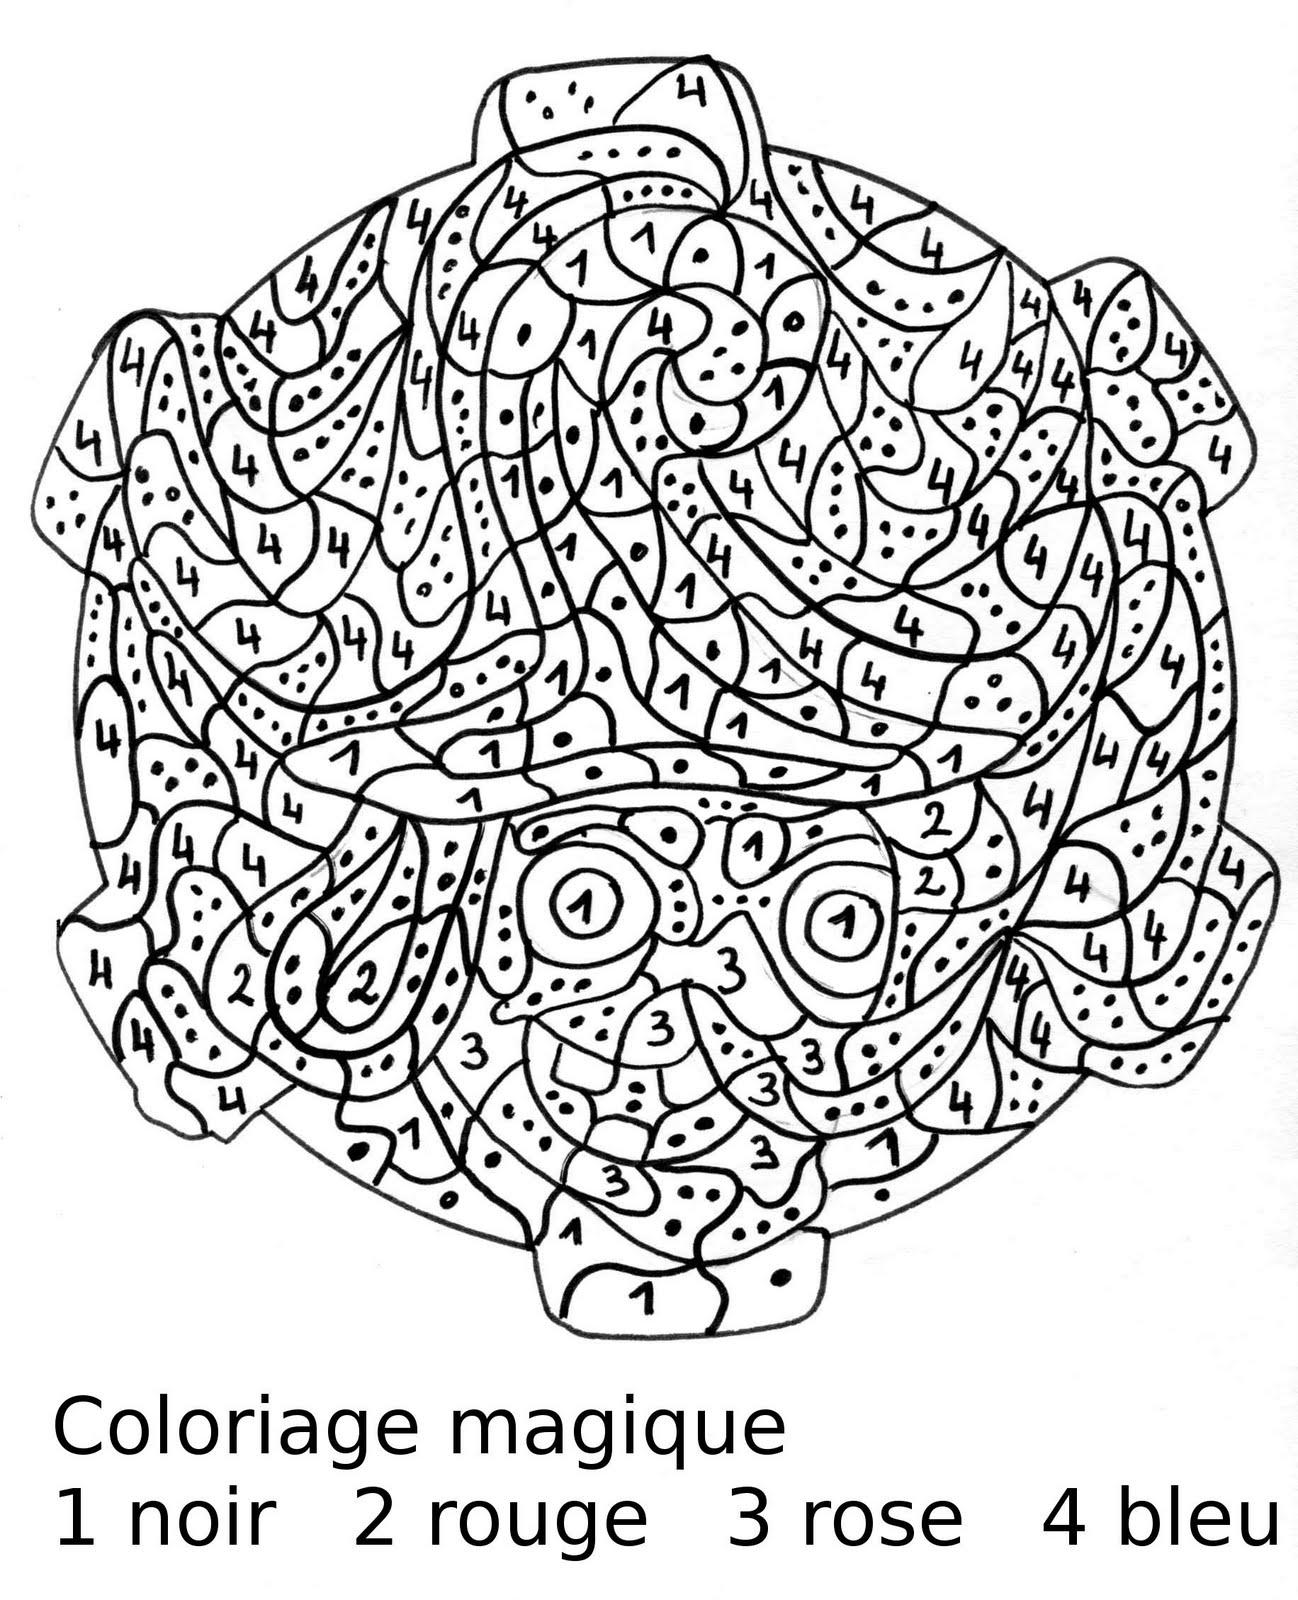 dessin magique ce2 hugo l'escargot